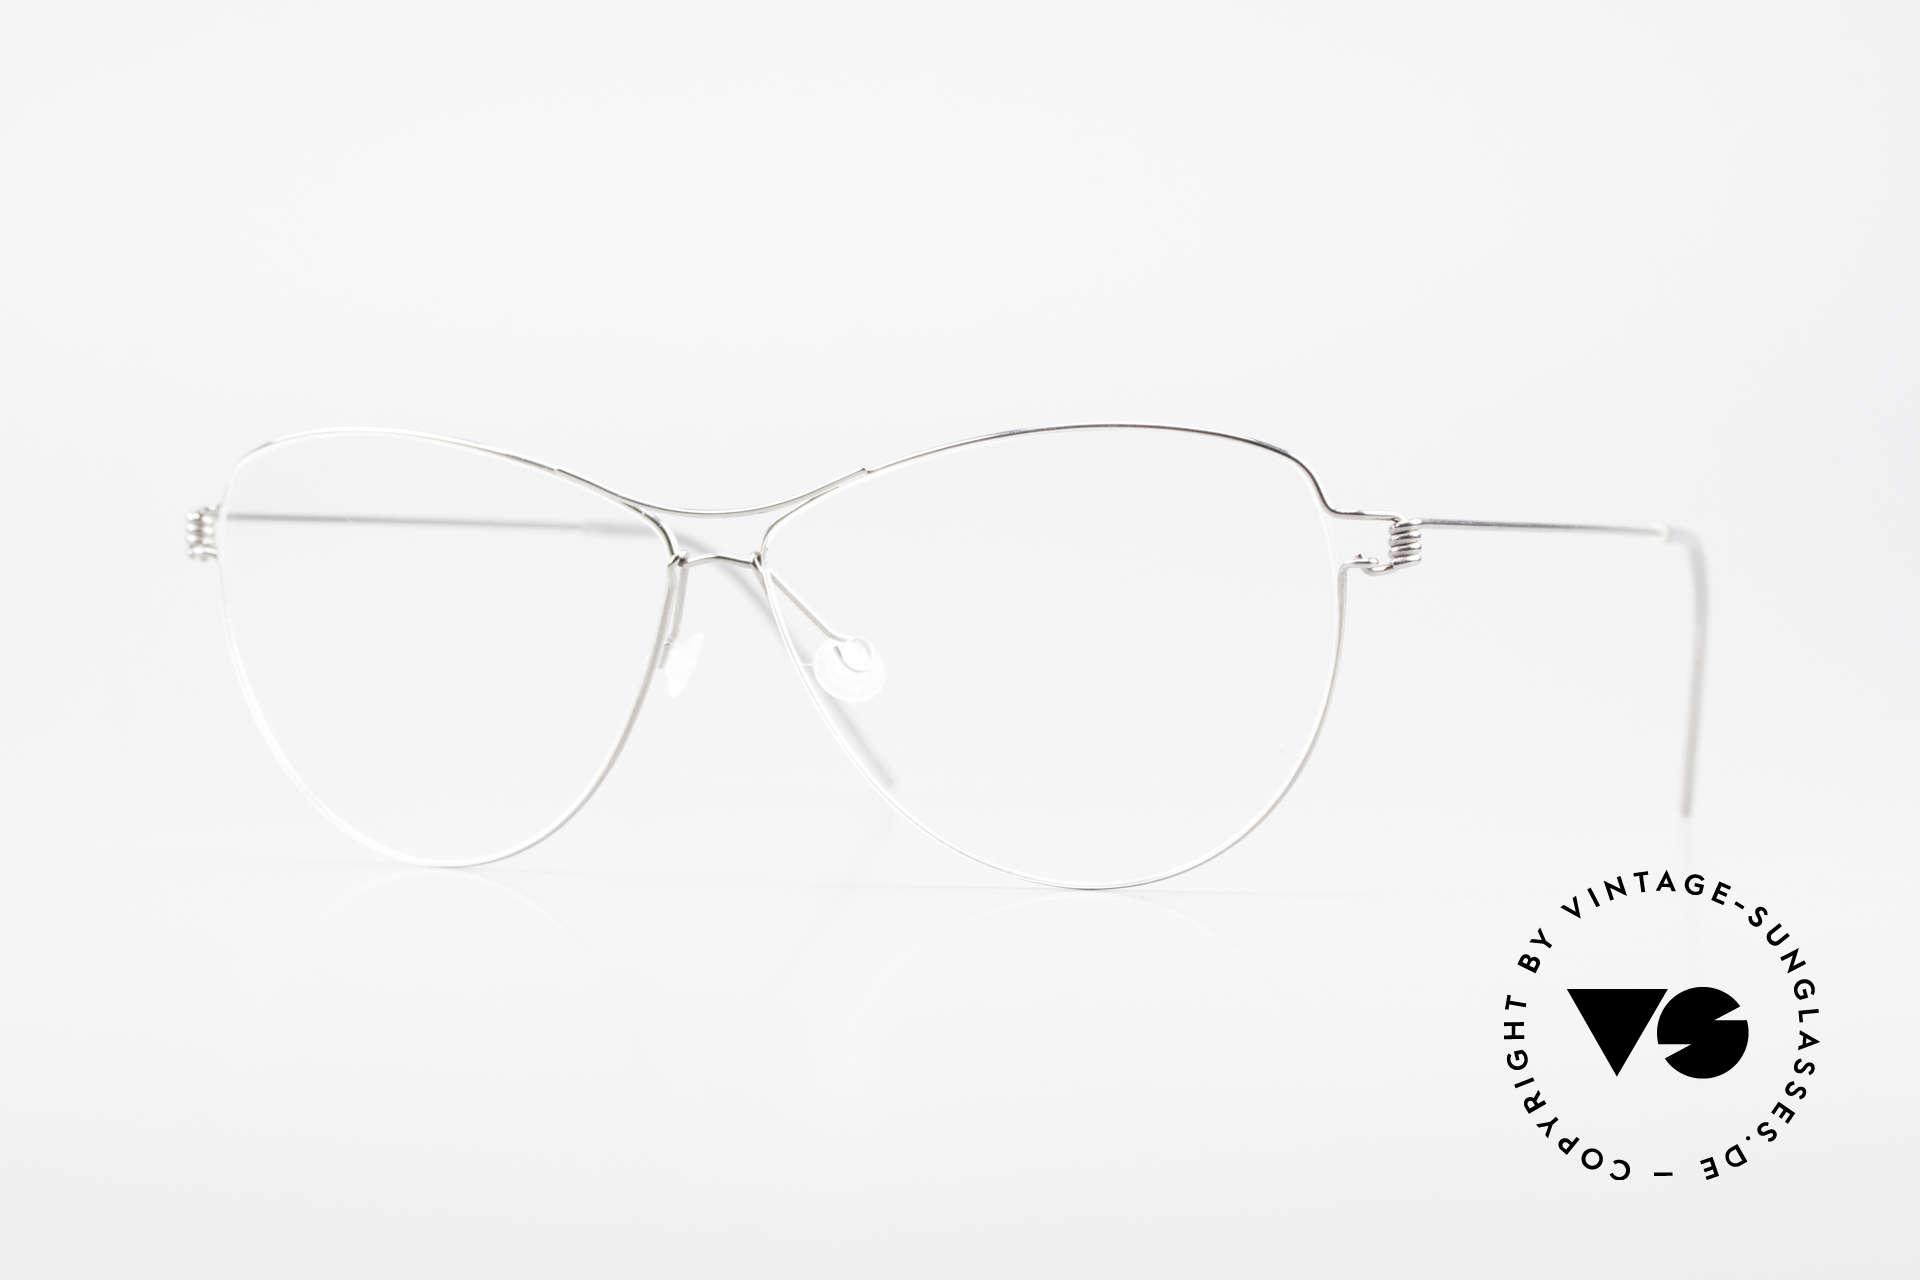 Lindberg Ditte Air Titan Rim Titanium Frame Ladies Aviator, LINDBERG Air Titanium Rim eyeglasses in size 57-19, Made for Women